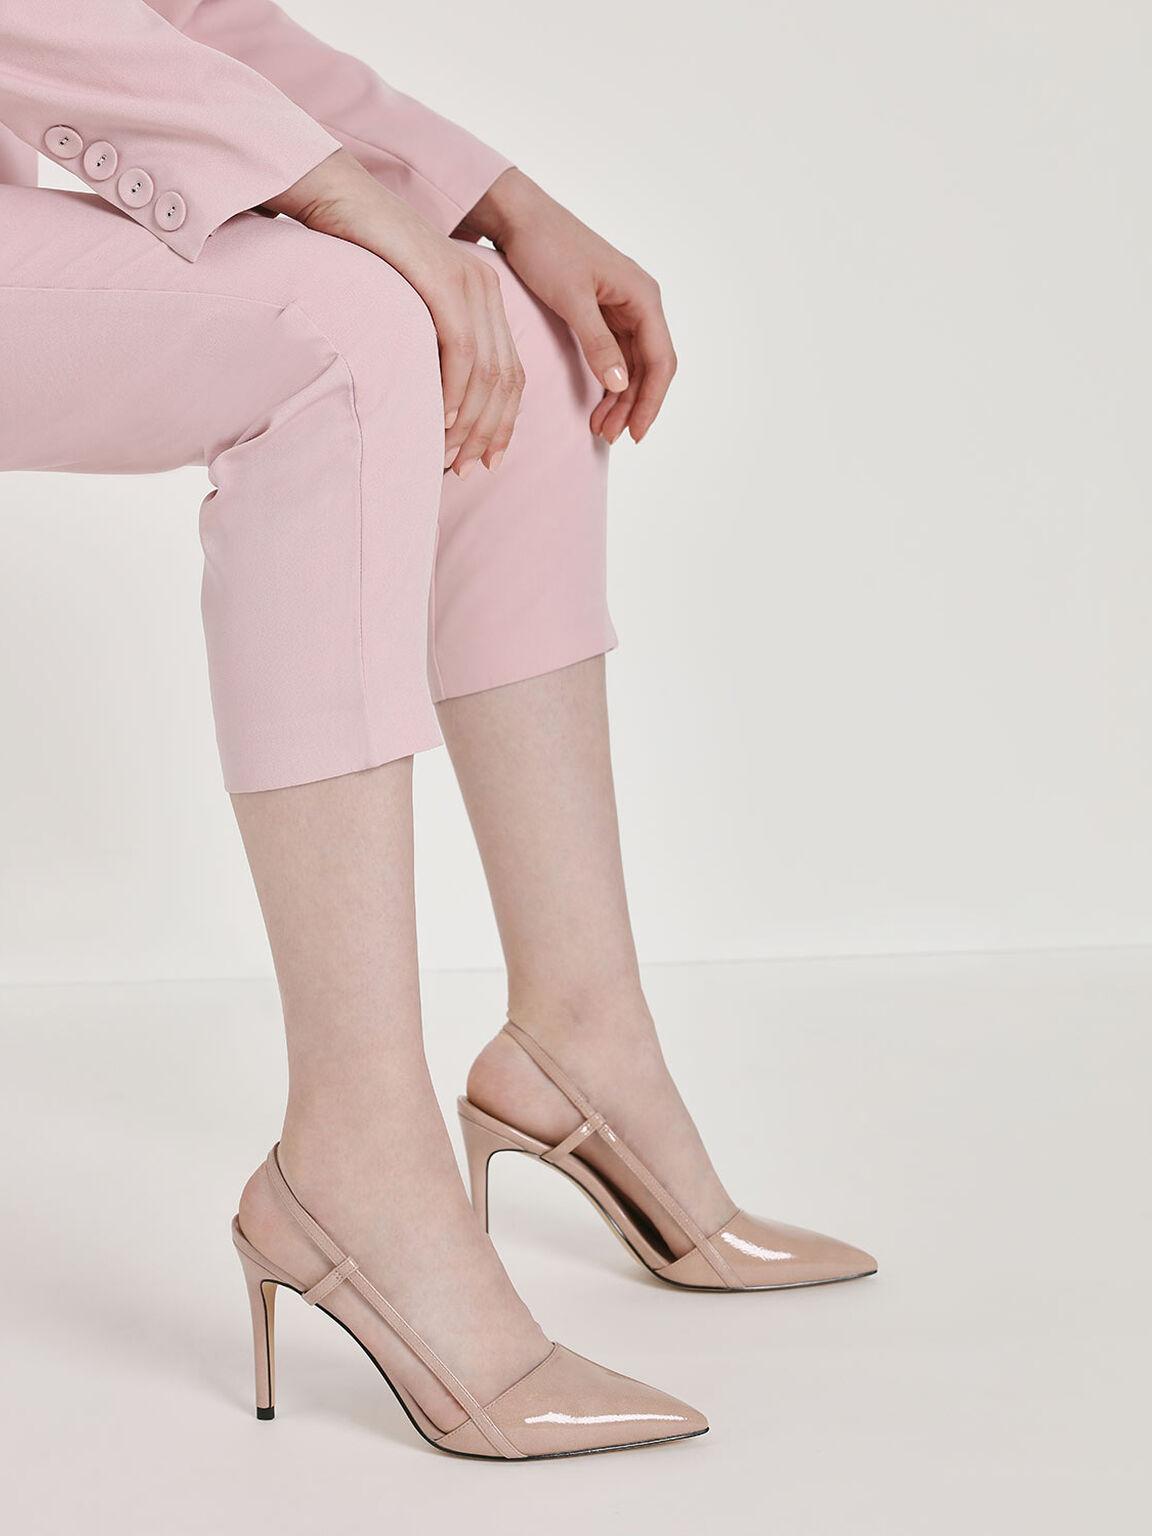 Pointed Toe Slingback Heels, Nude, hi-res